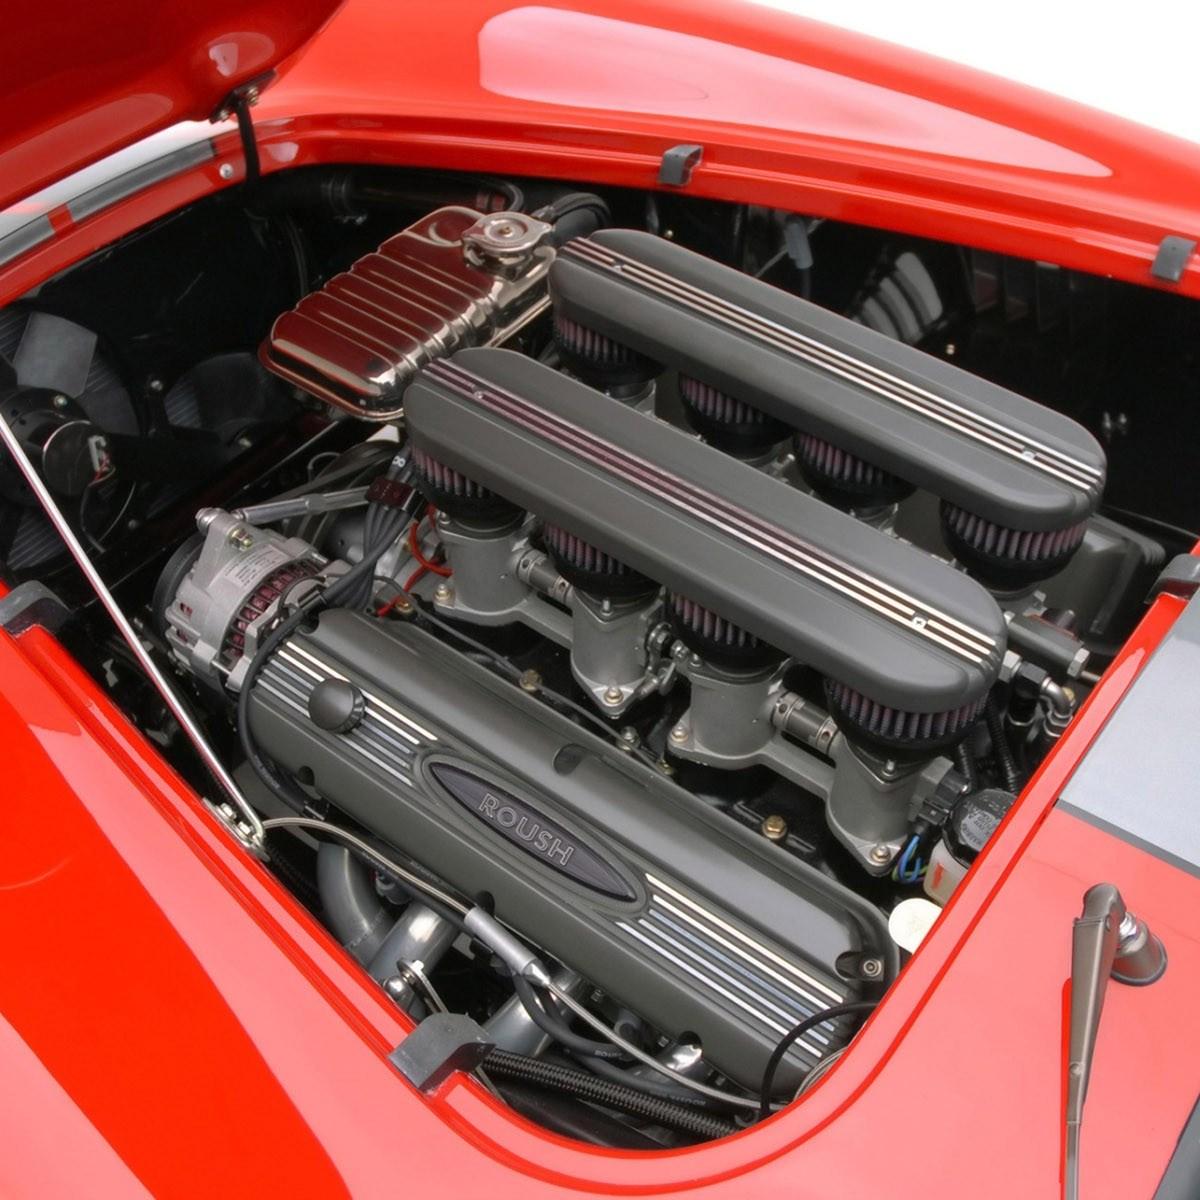 2009 Superformance Roush MKIII R